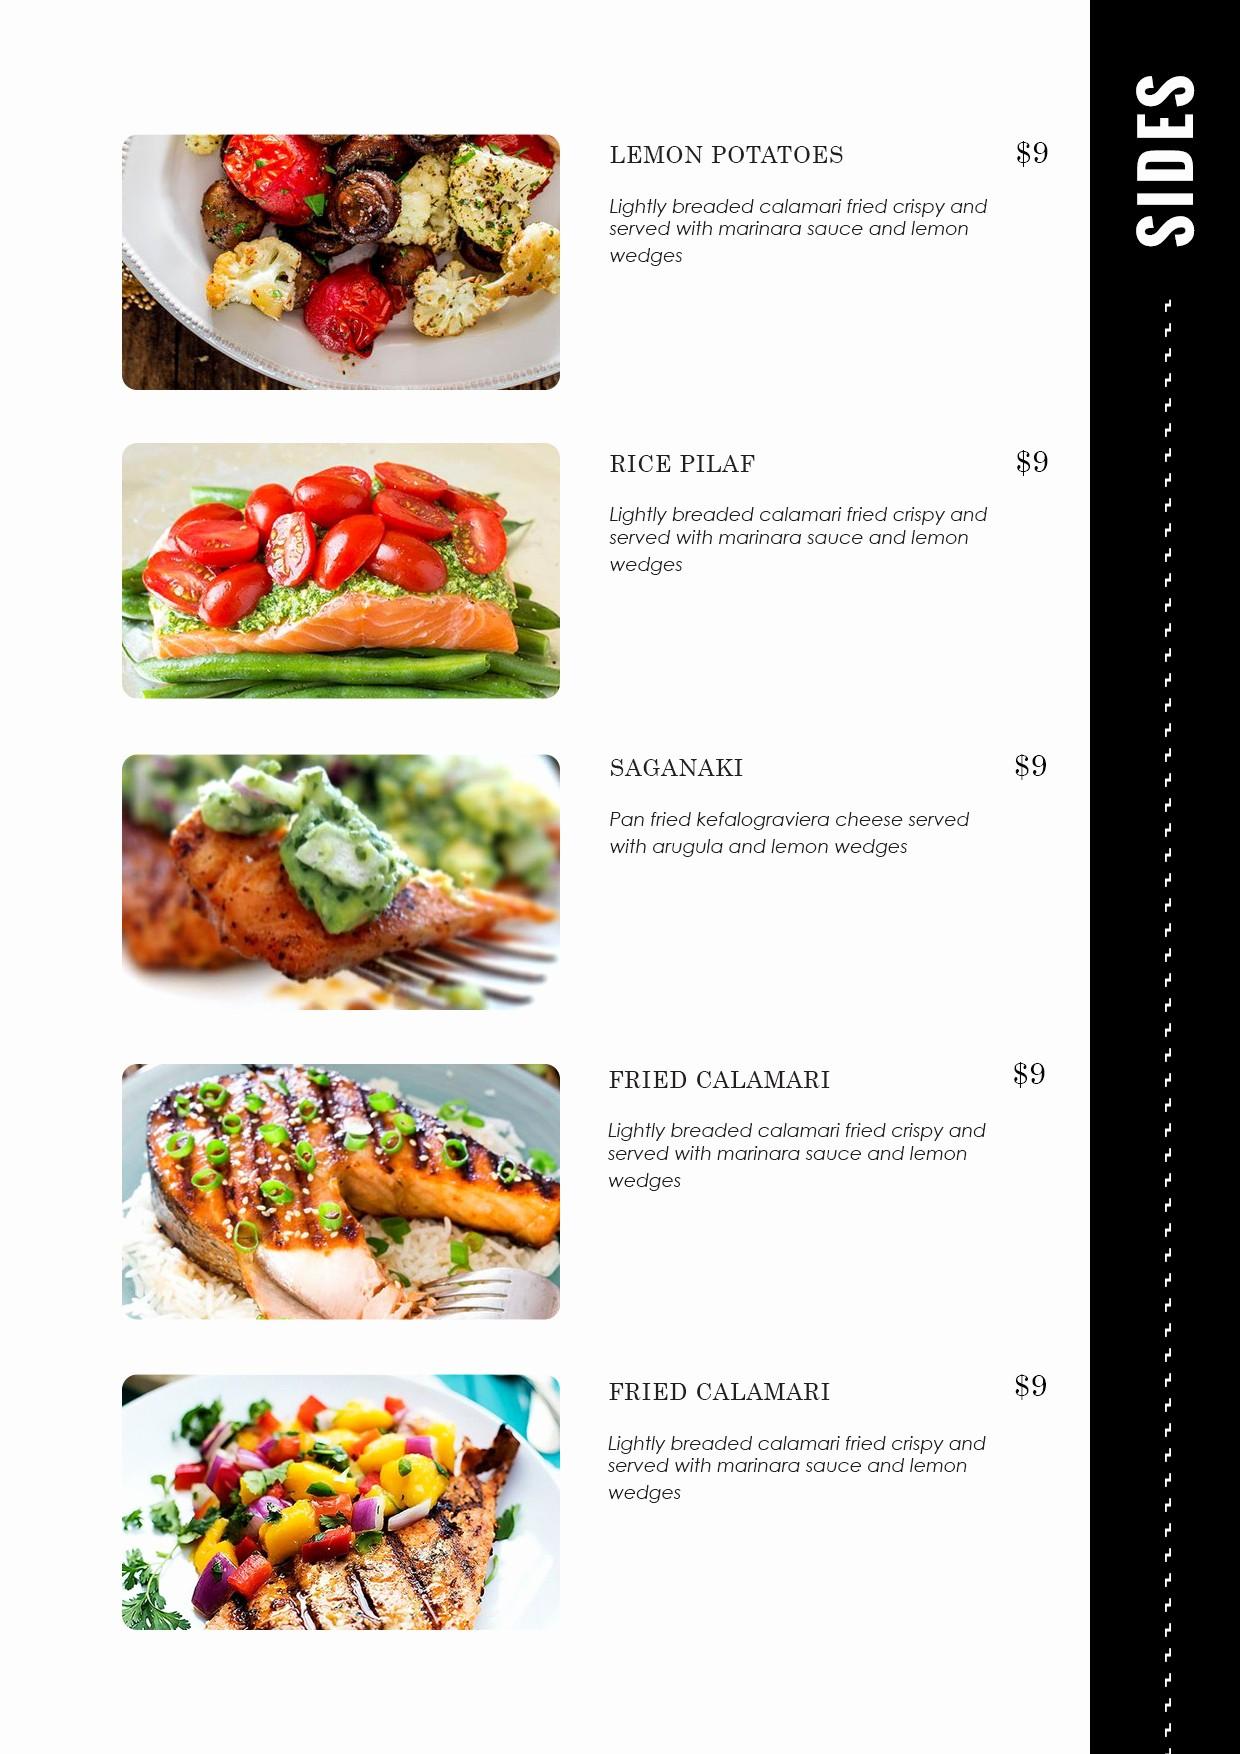 Free Menu Template Microsoft Word Lovely Design & Templates Menu Templates Wedding Menu Food